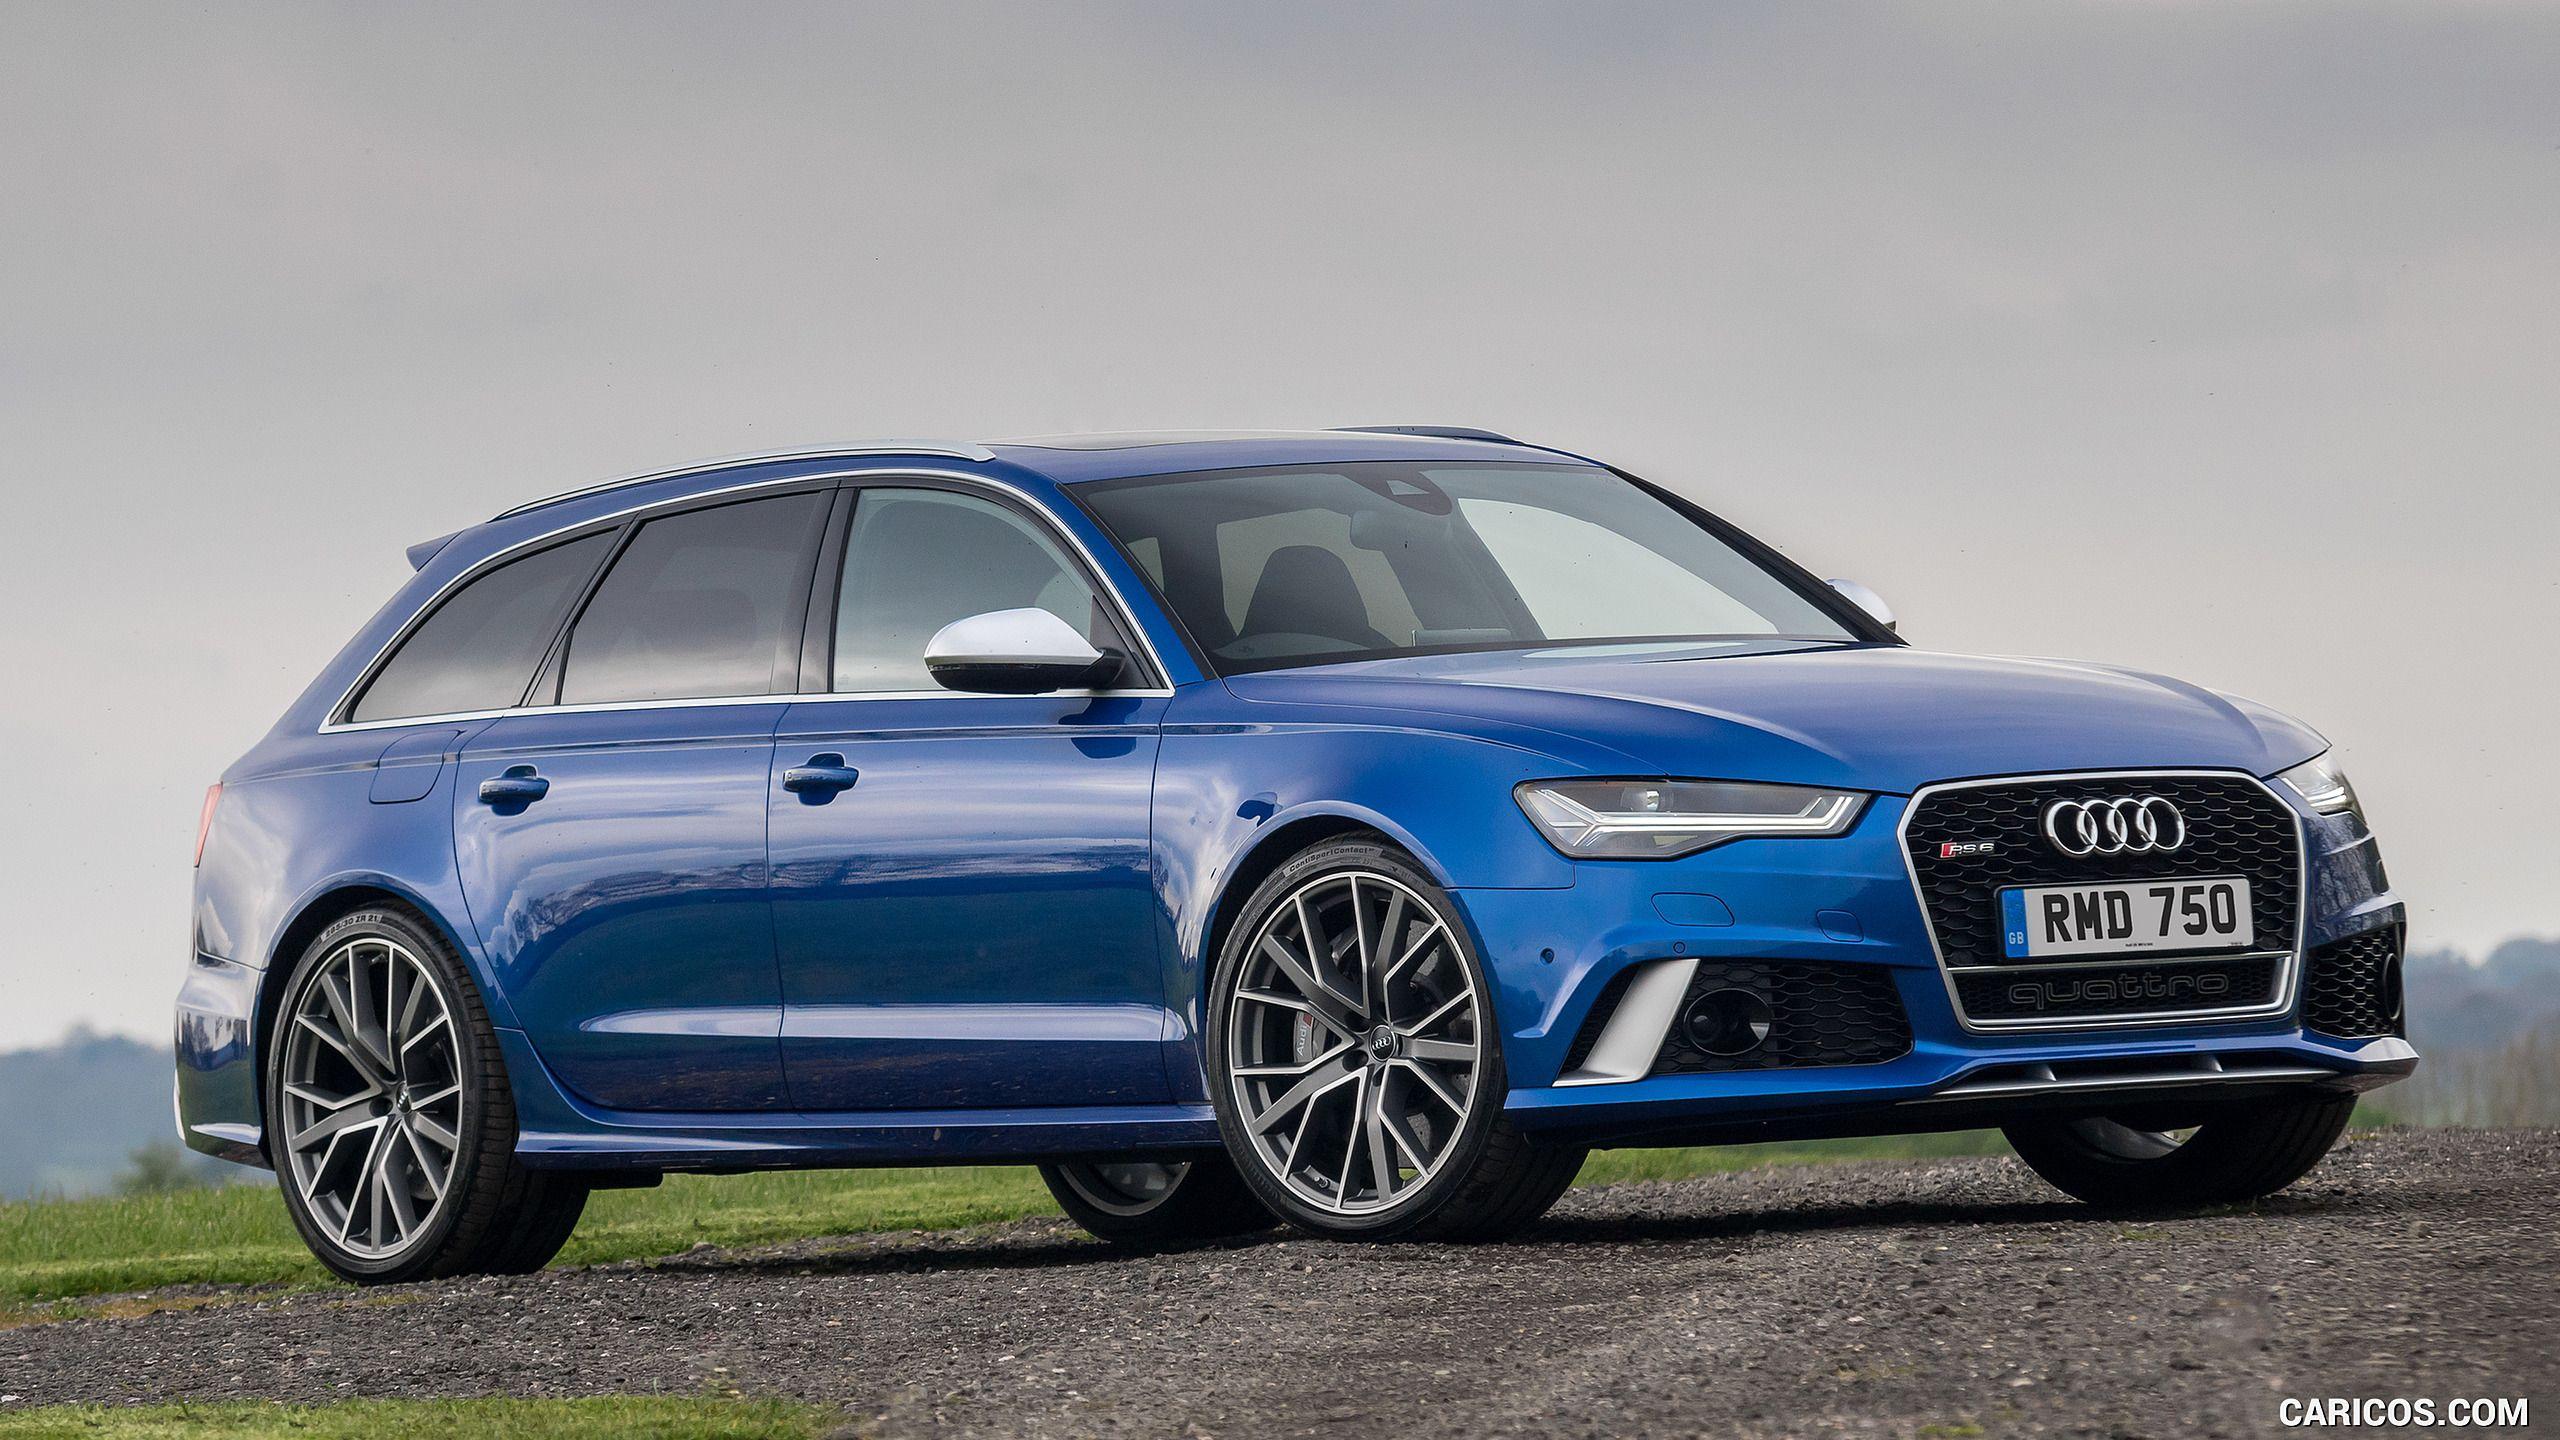 Kekurangan Audi Rs6 2016 Harga